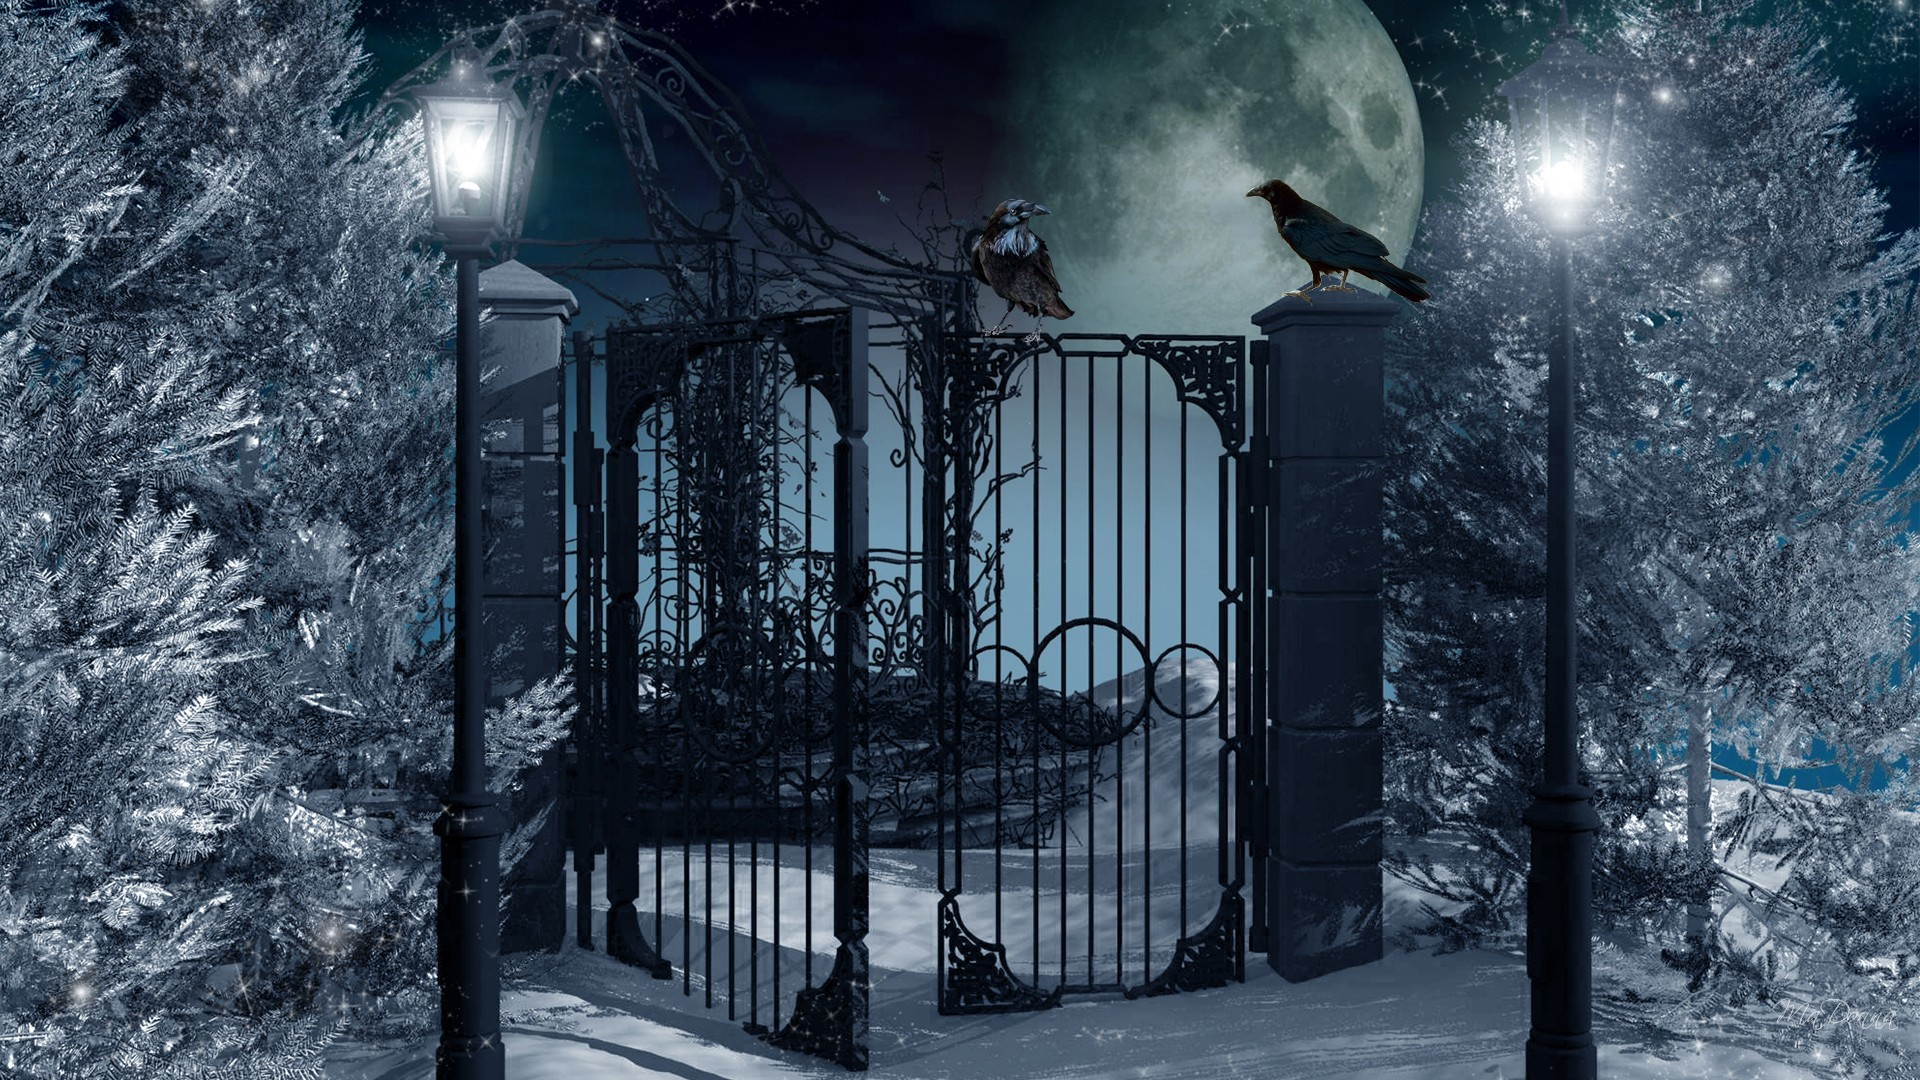 full moon on winter night full hd wallpaper and